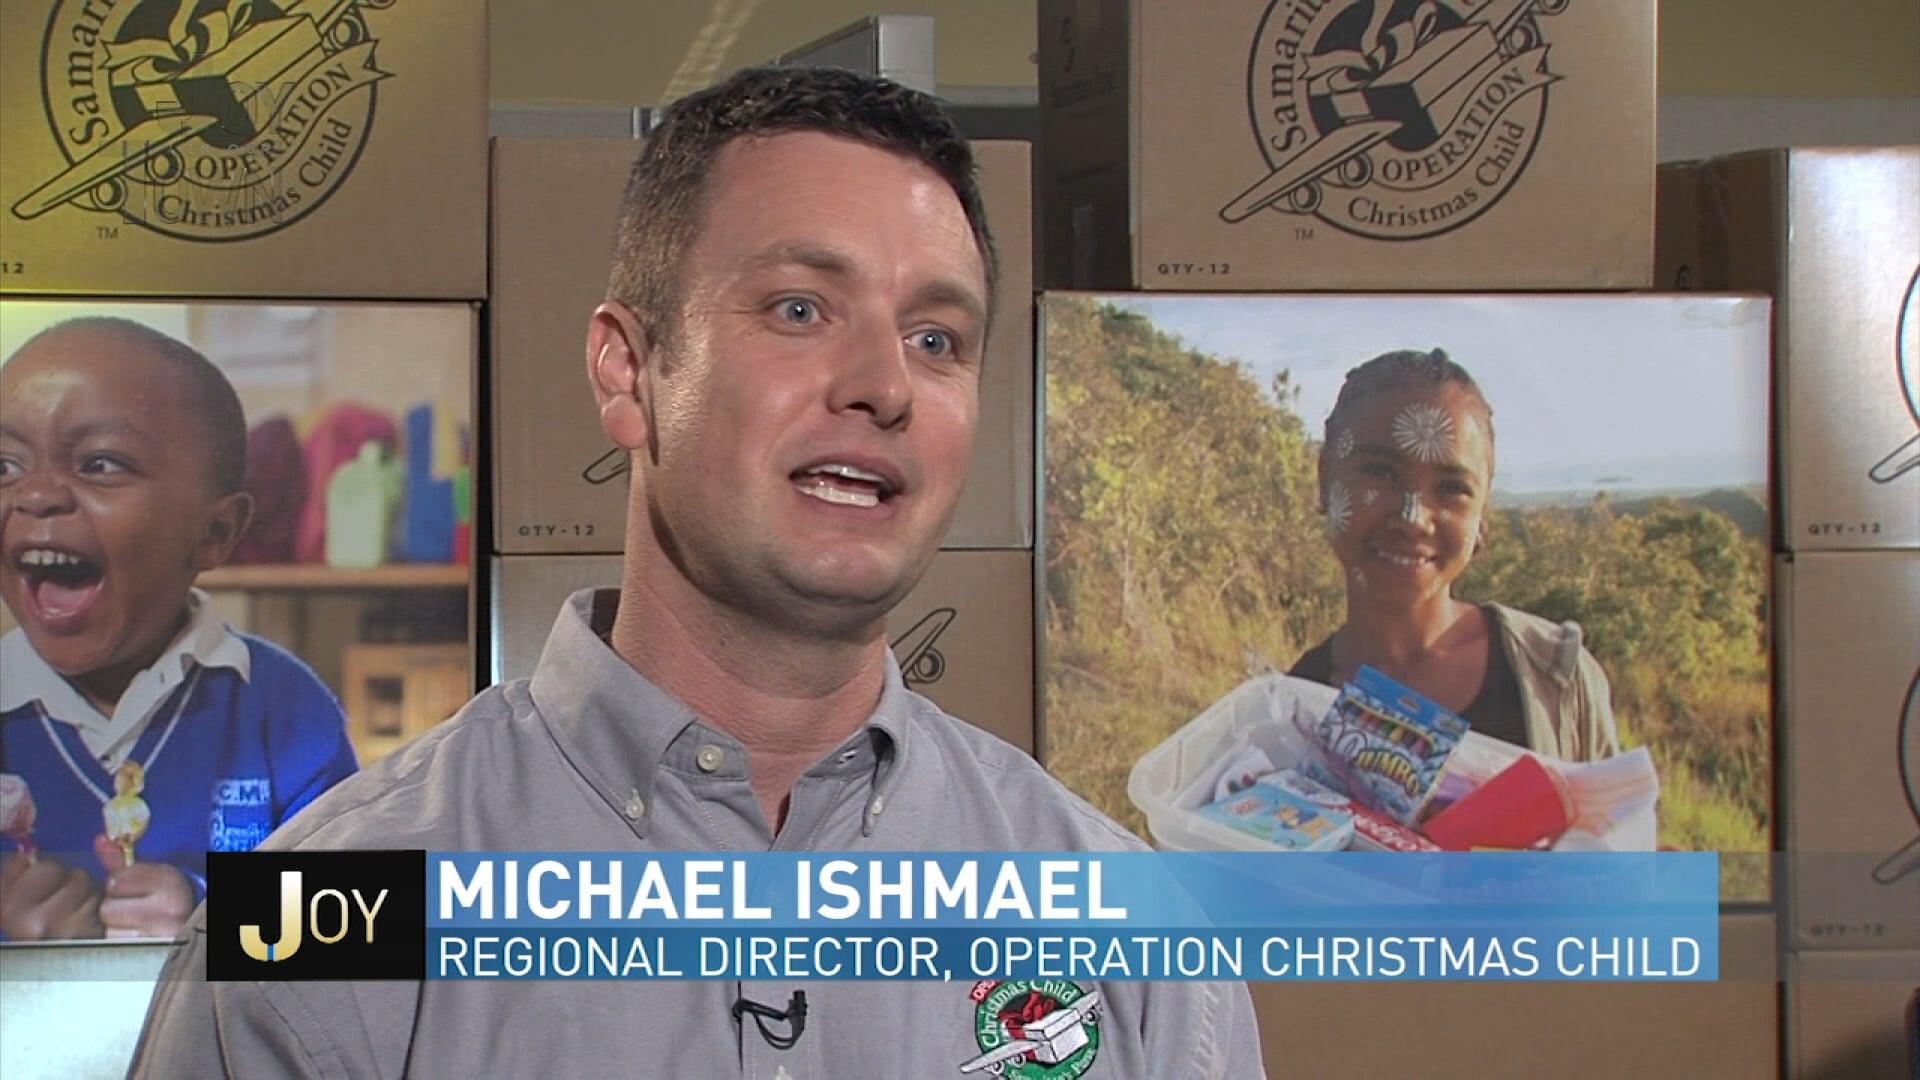 Samaritan's Purse - Operation Christmas Child